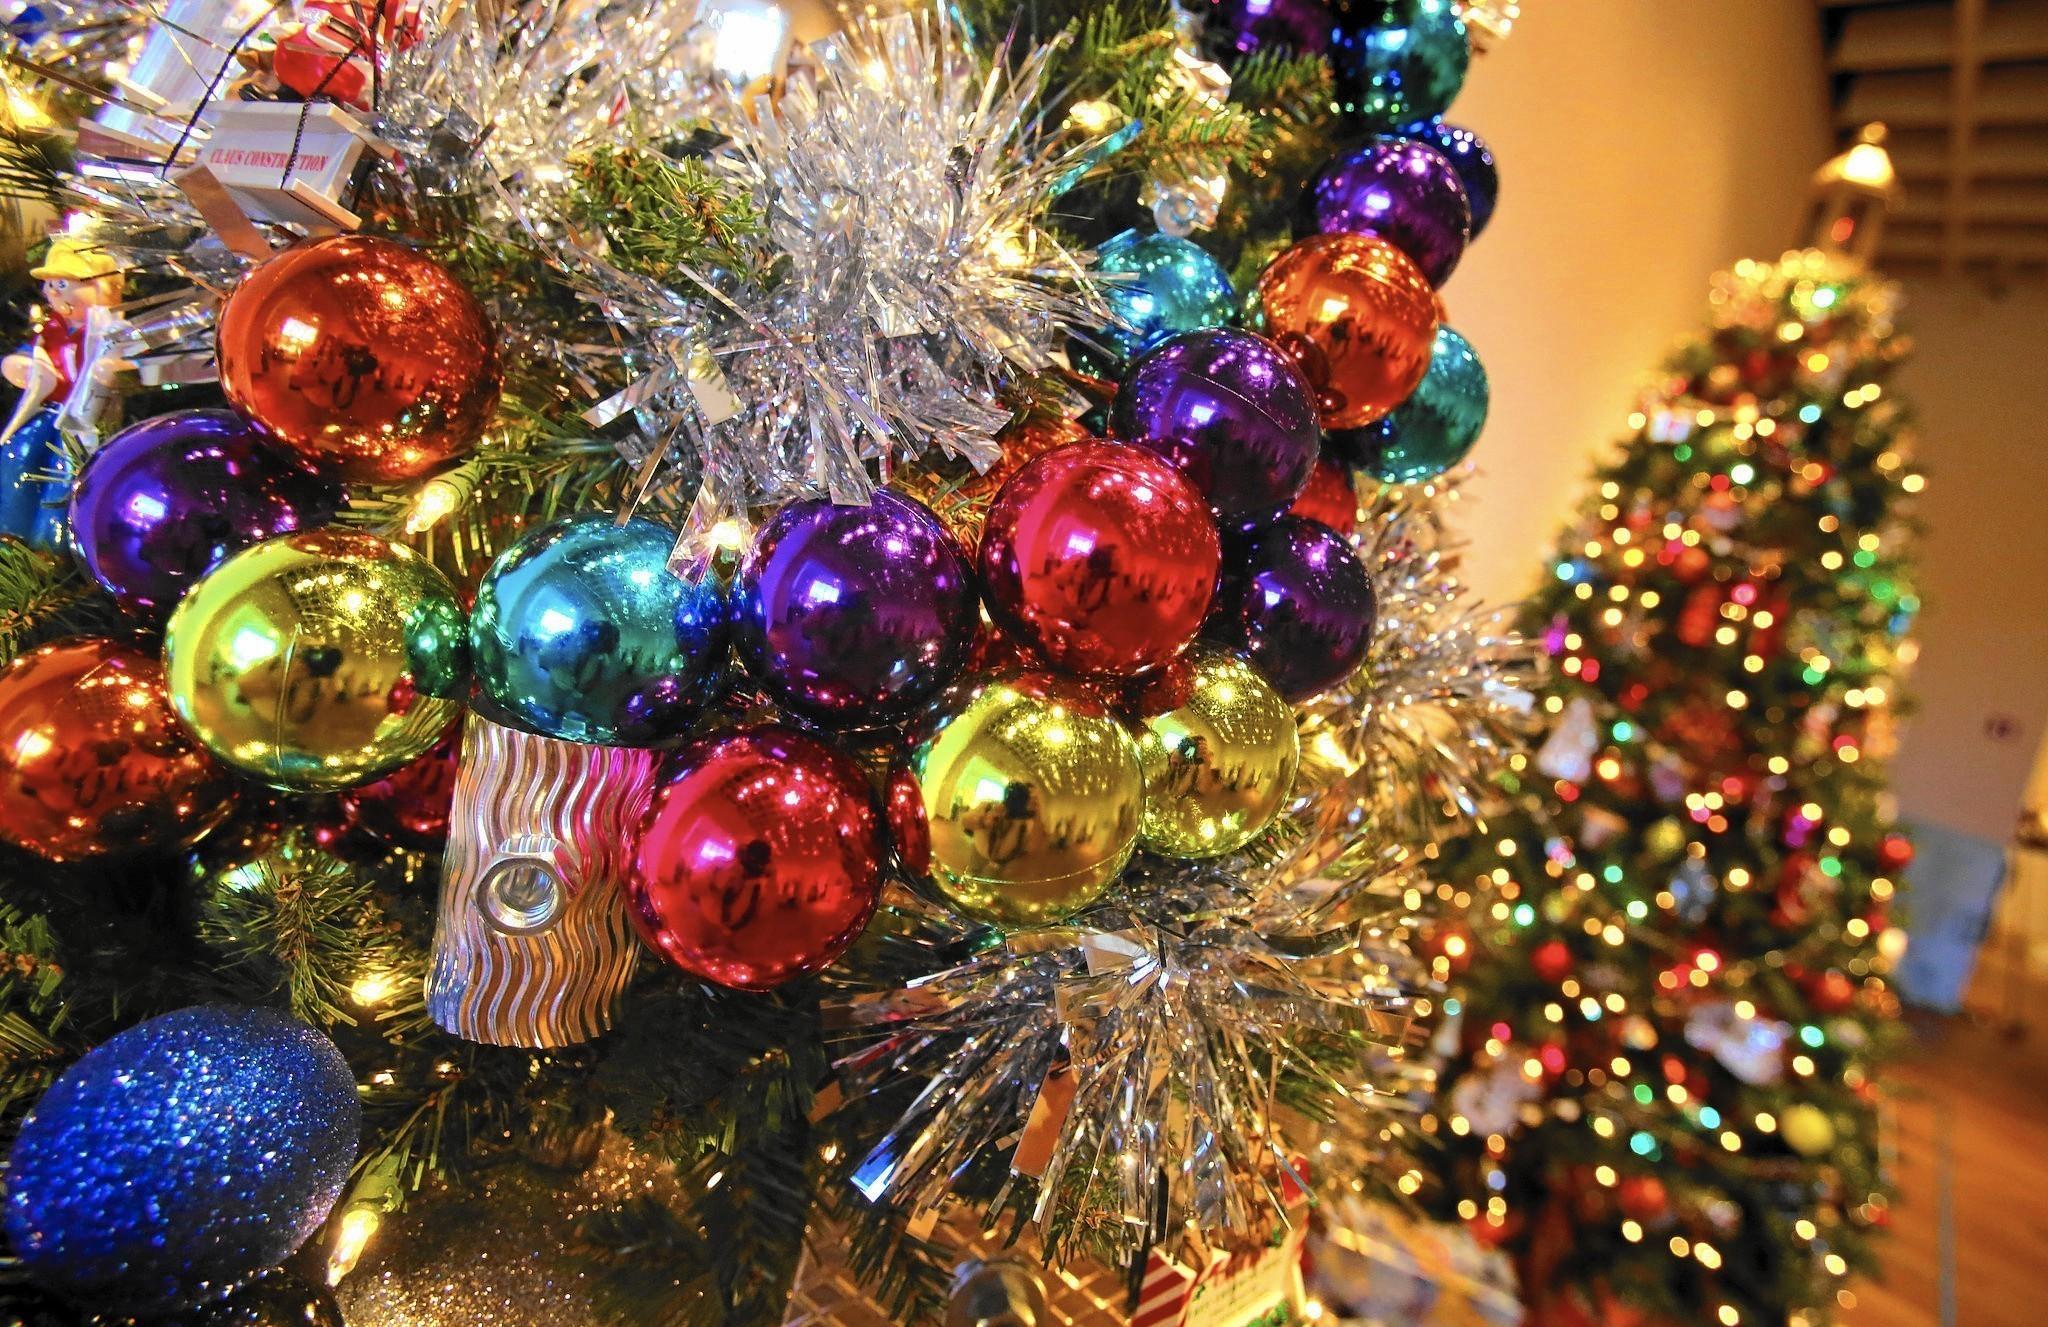 Hummel christmas tree ornaments - Hummel Christmas Tree Ornaments 40